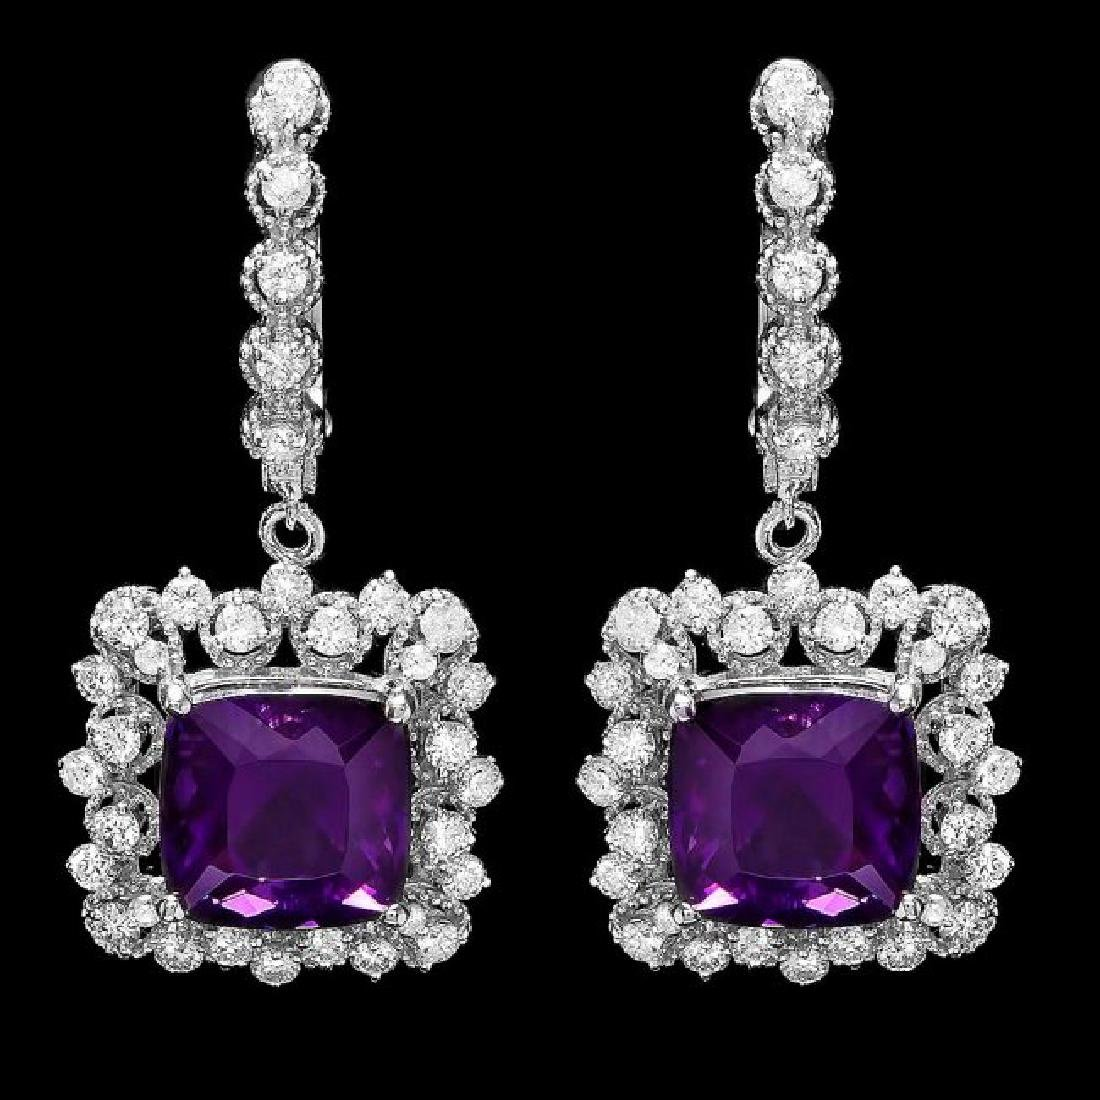 14k Gold 10.00ct Amethyst 2.00ct Diamond Earrings